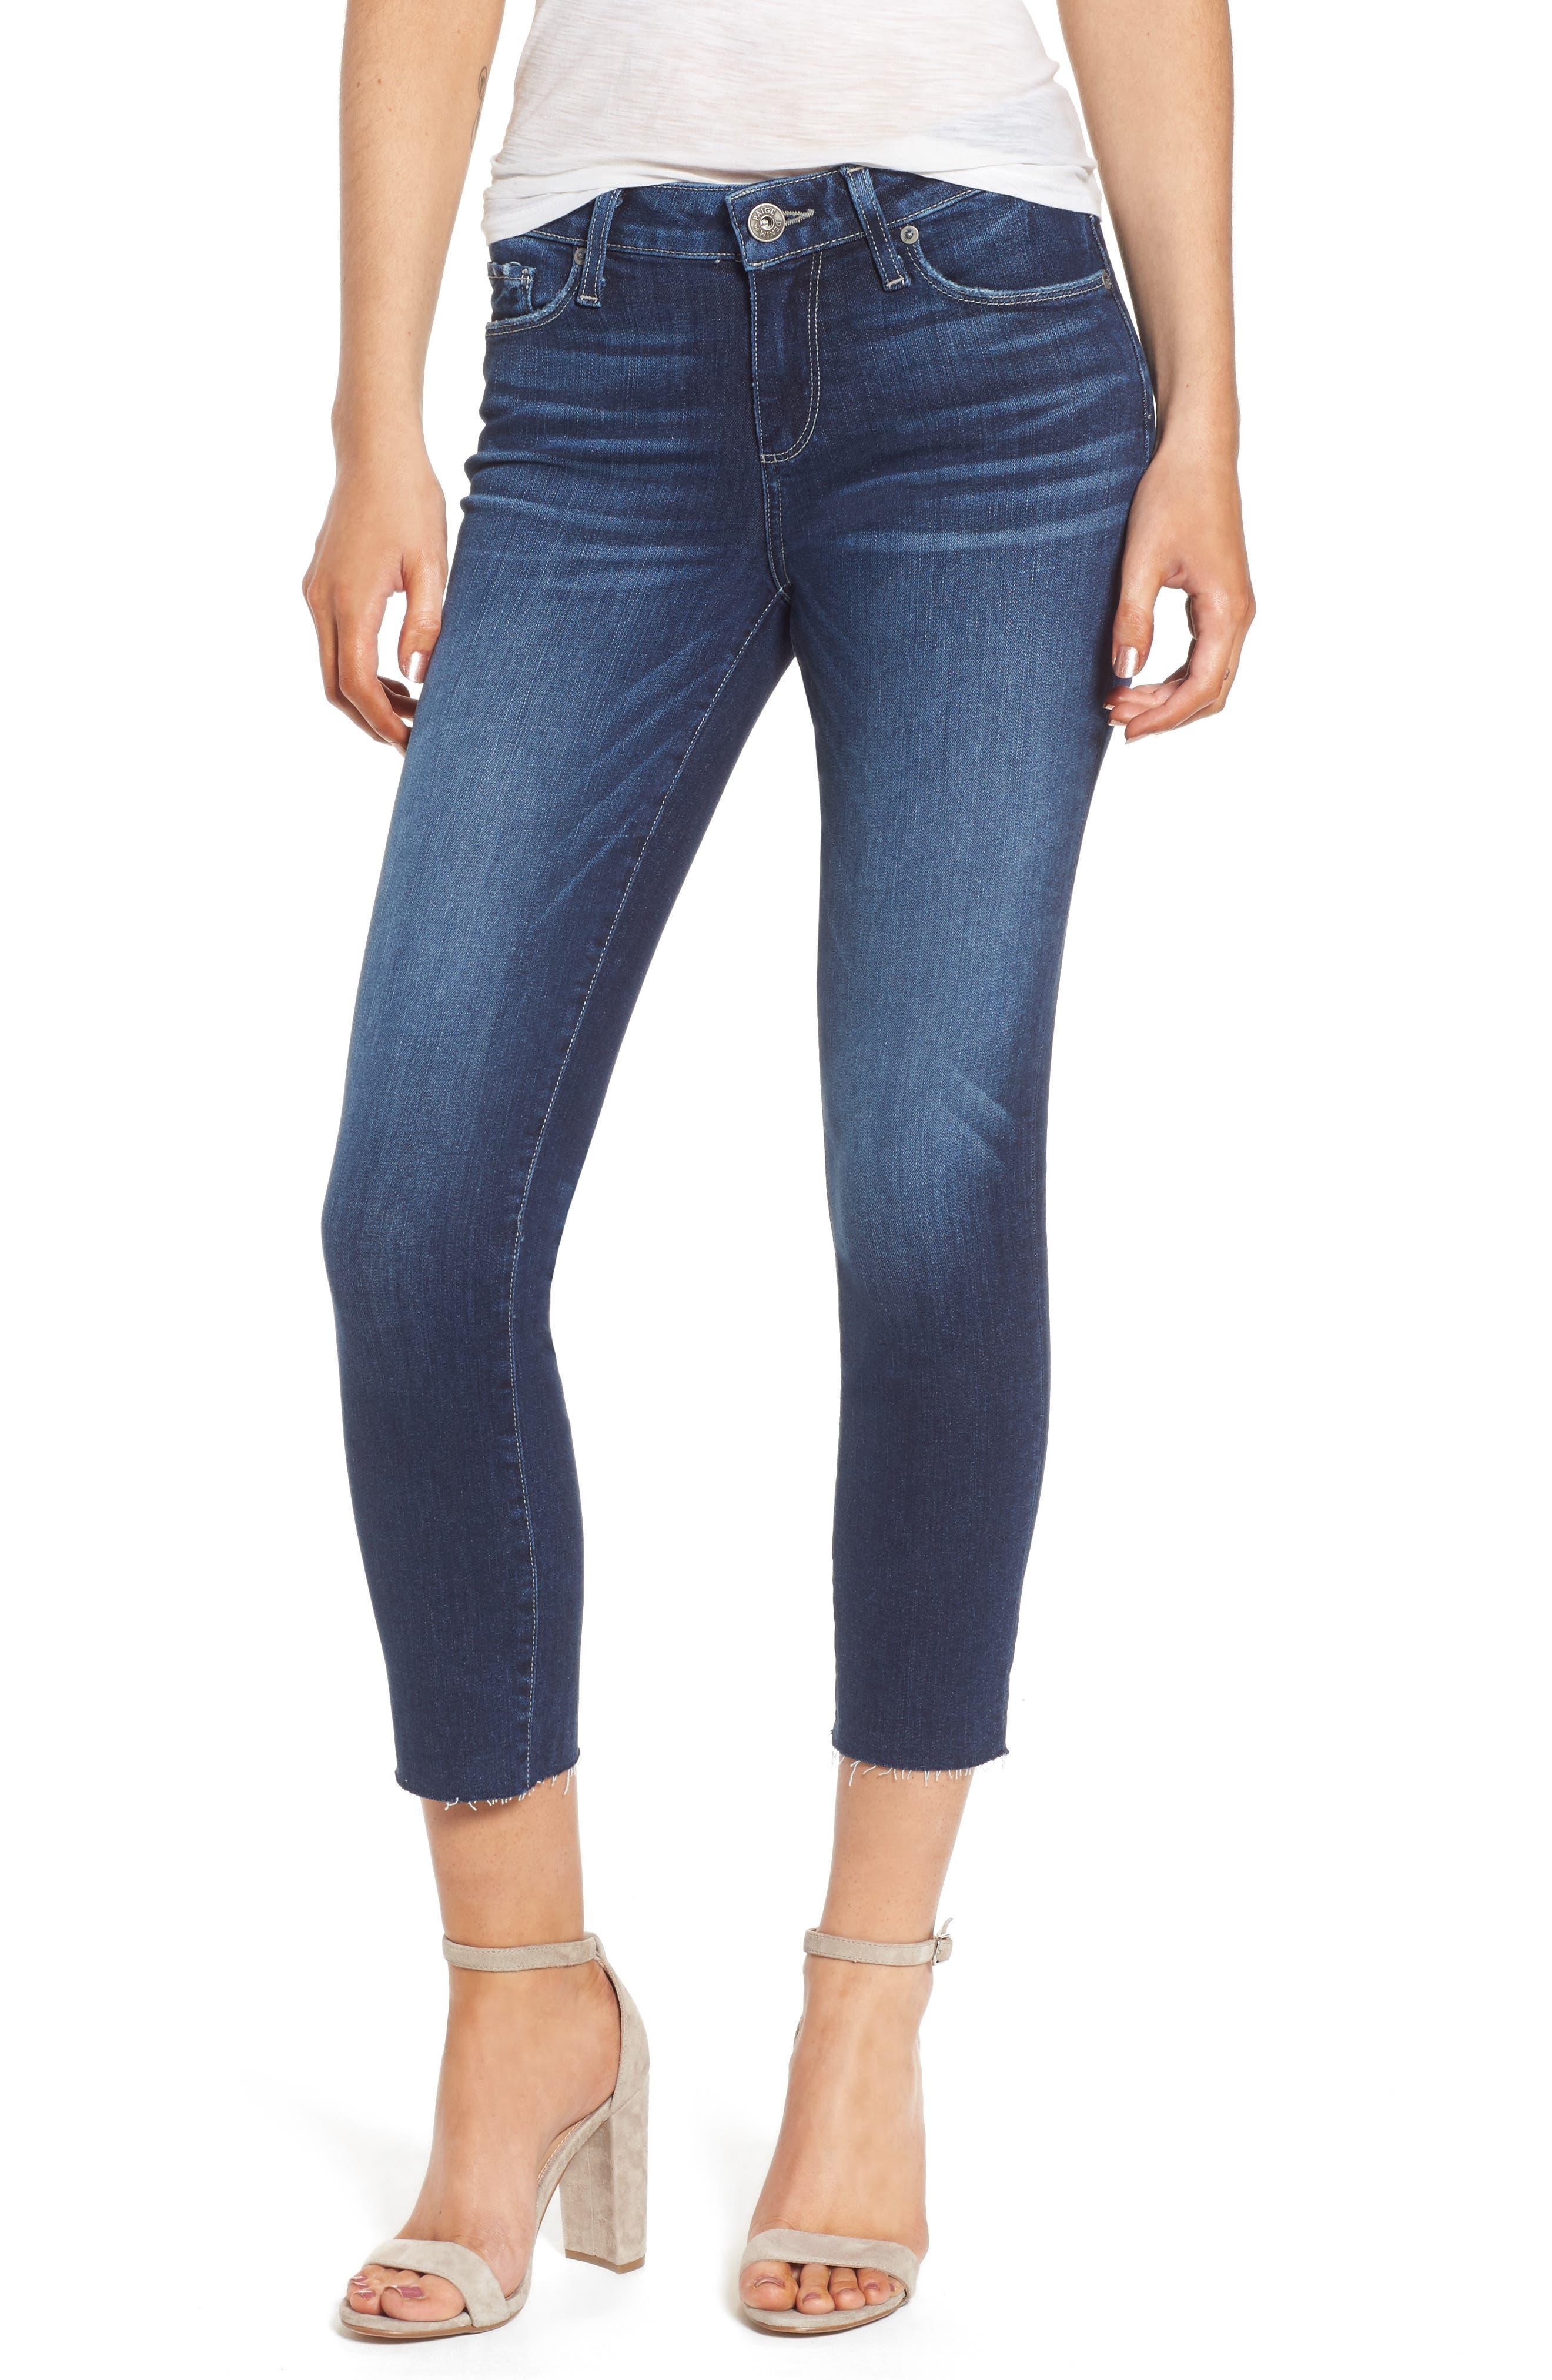 Transcend - Skyline Crop Skinny Jeans,                             Main thumbnail 1, color,                             Kylen